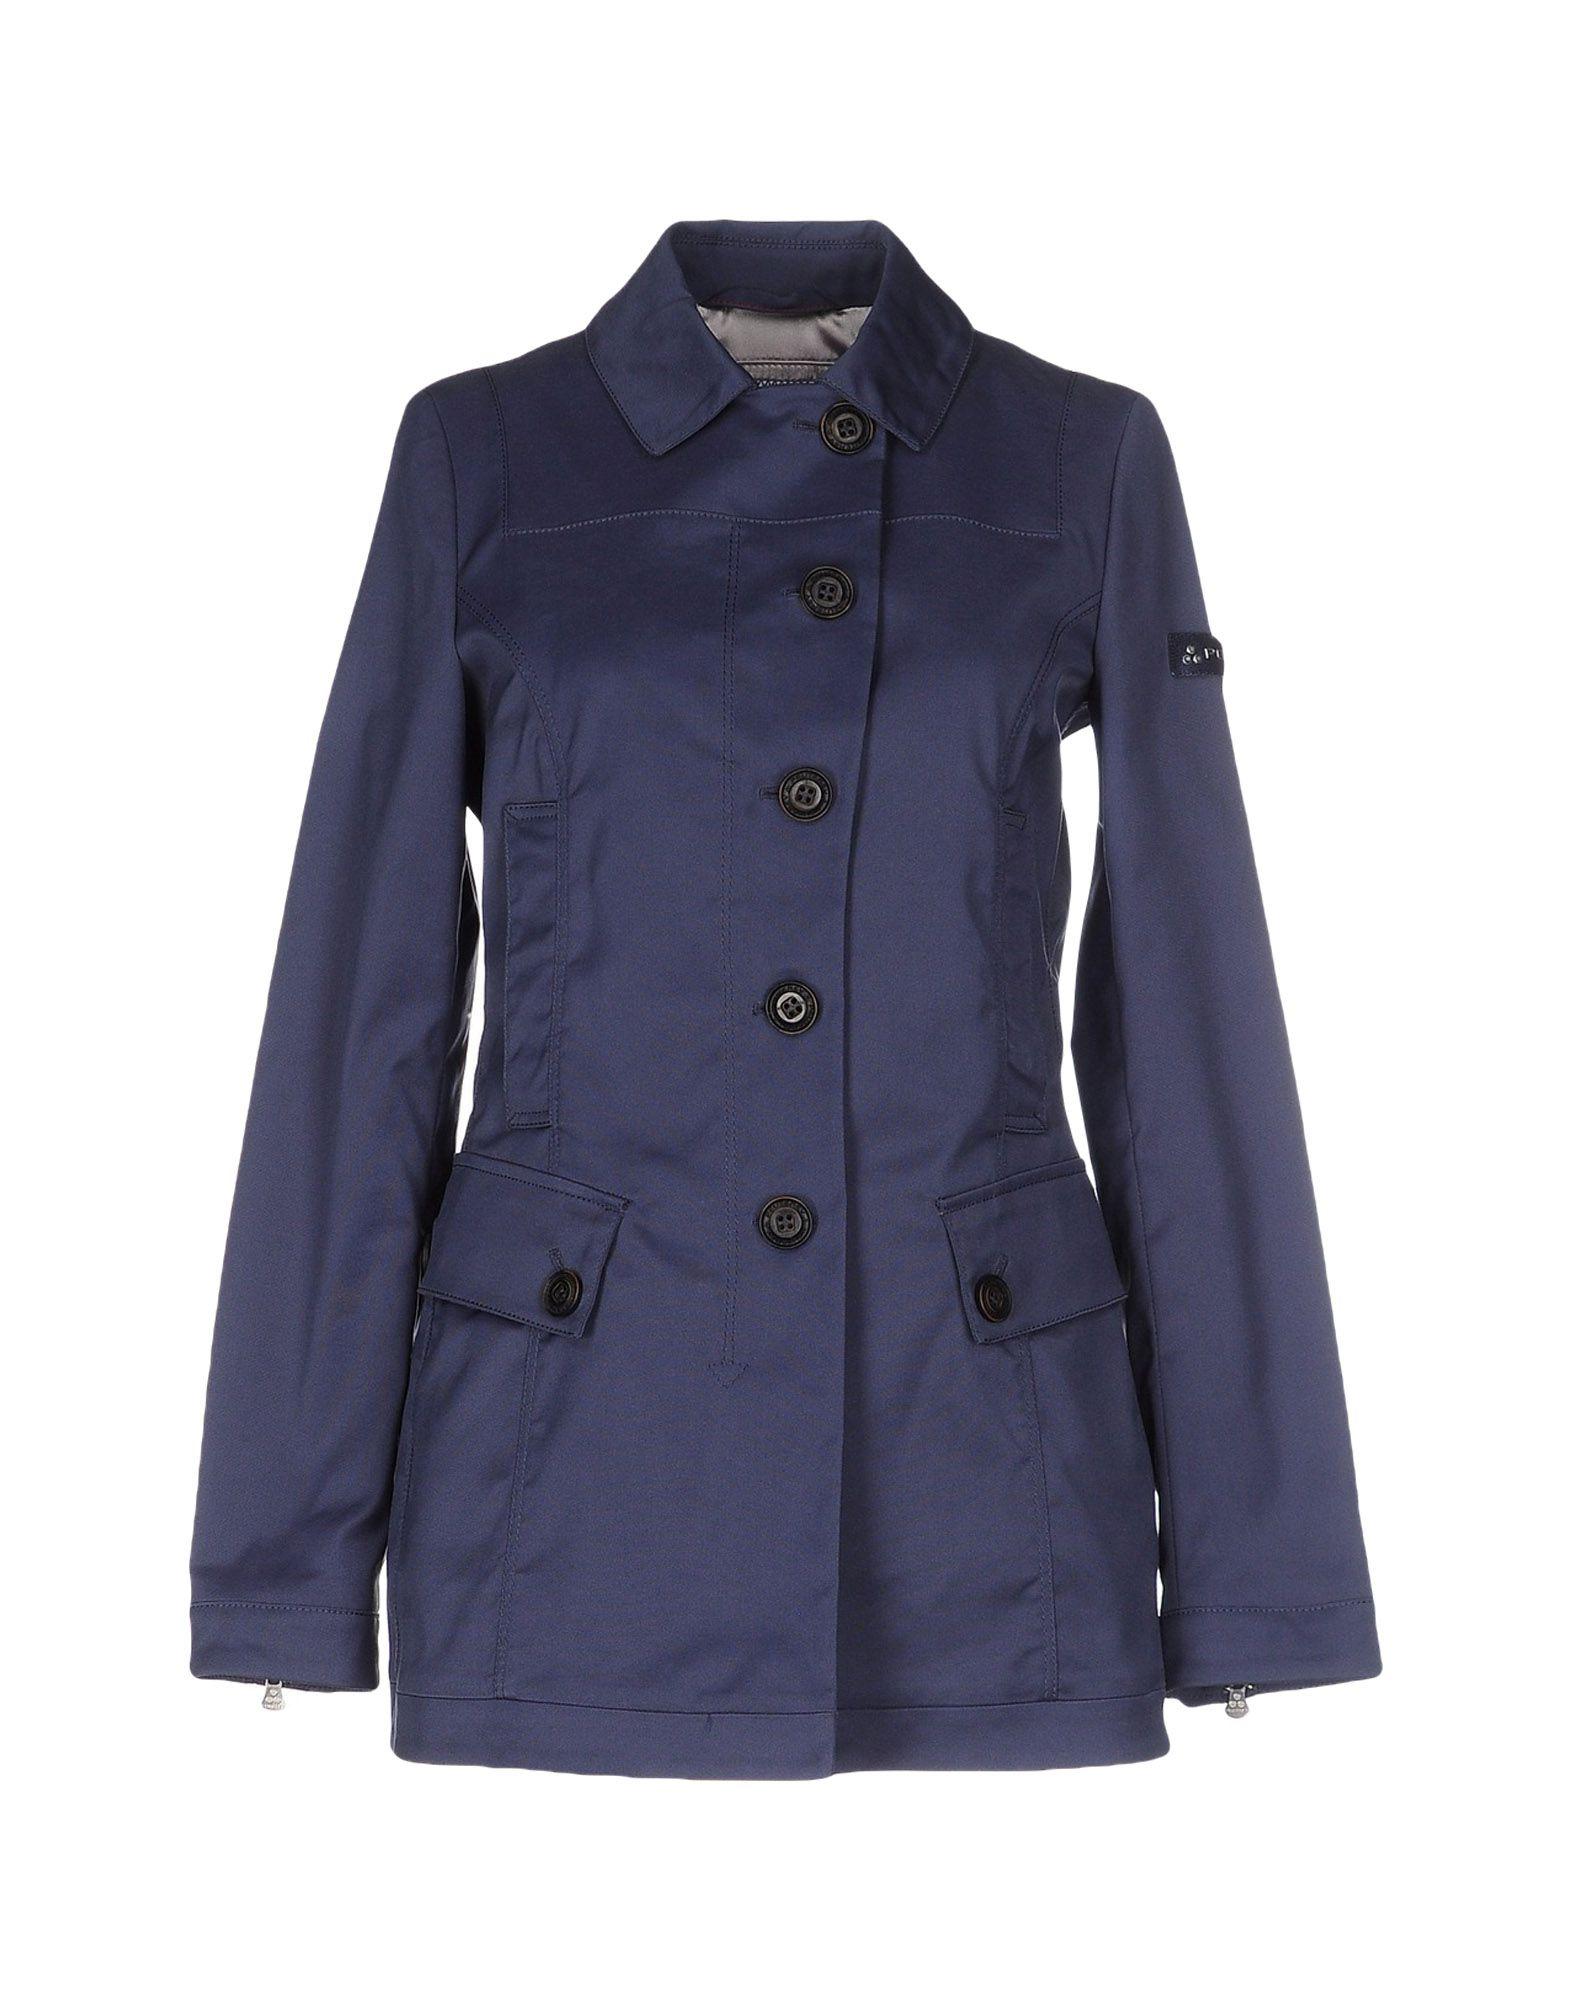 the best attitude 8d5e4 d7b1d Peuterey Women - Jackets and Dresses - Shop Online at YOOX